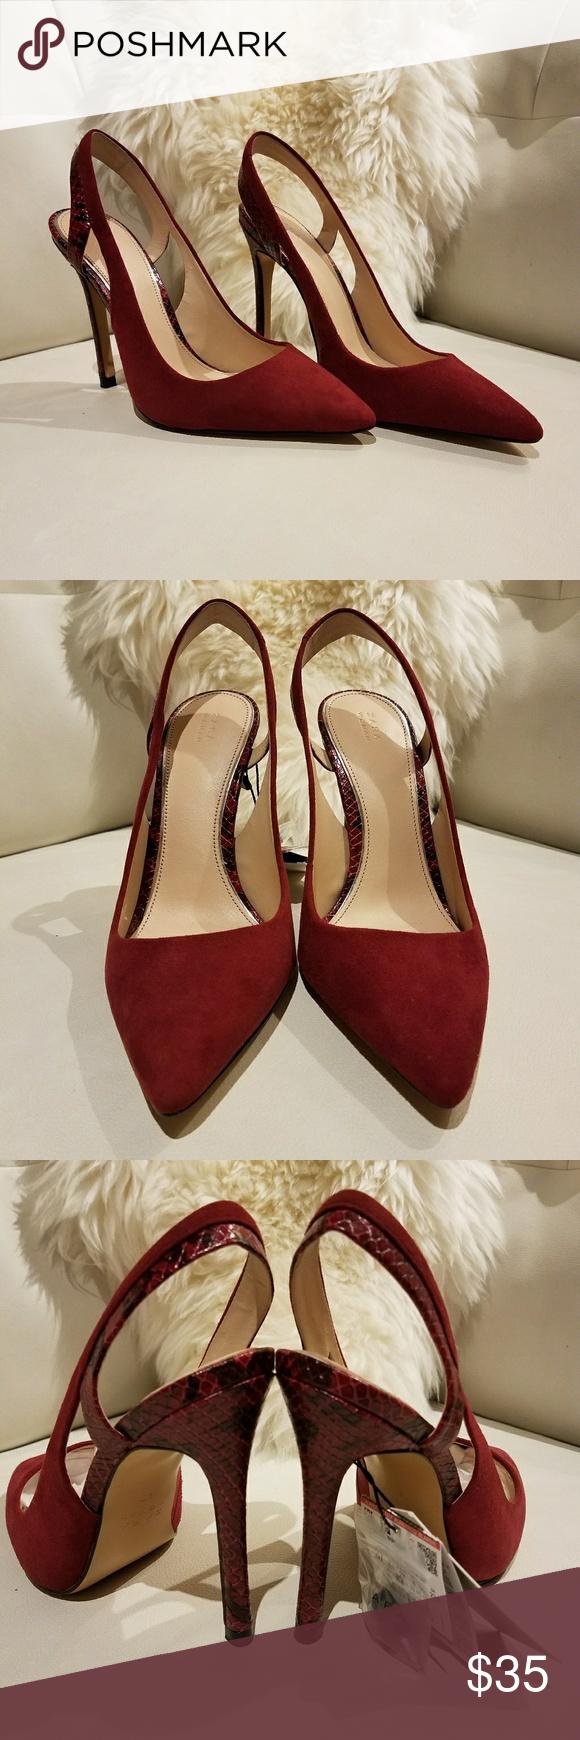 a01aa3bf136 ZARA burgundy heels size 6.5 NWT 🔥👠 ZARA leather/ suede slingback ...